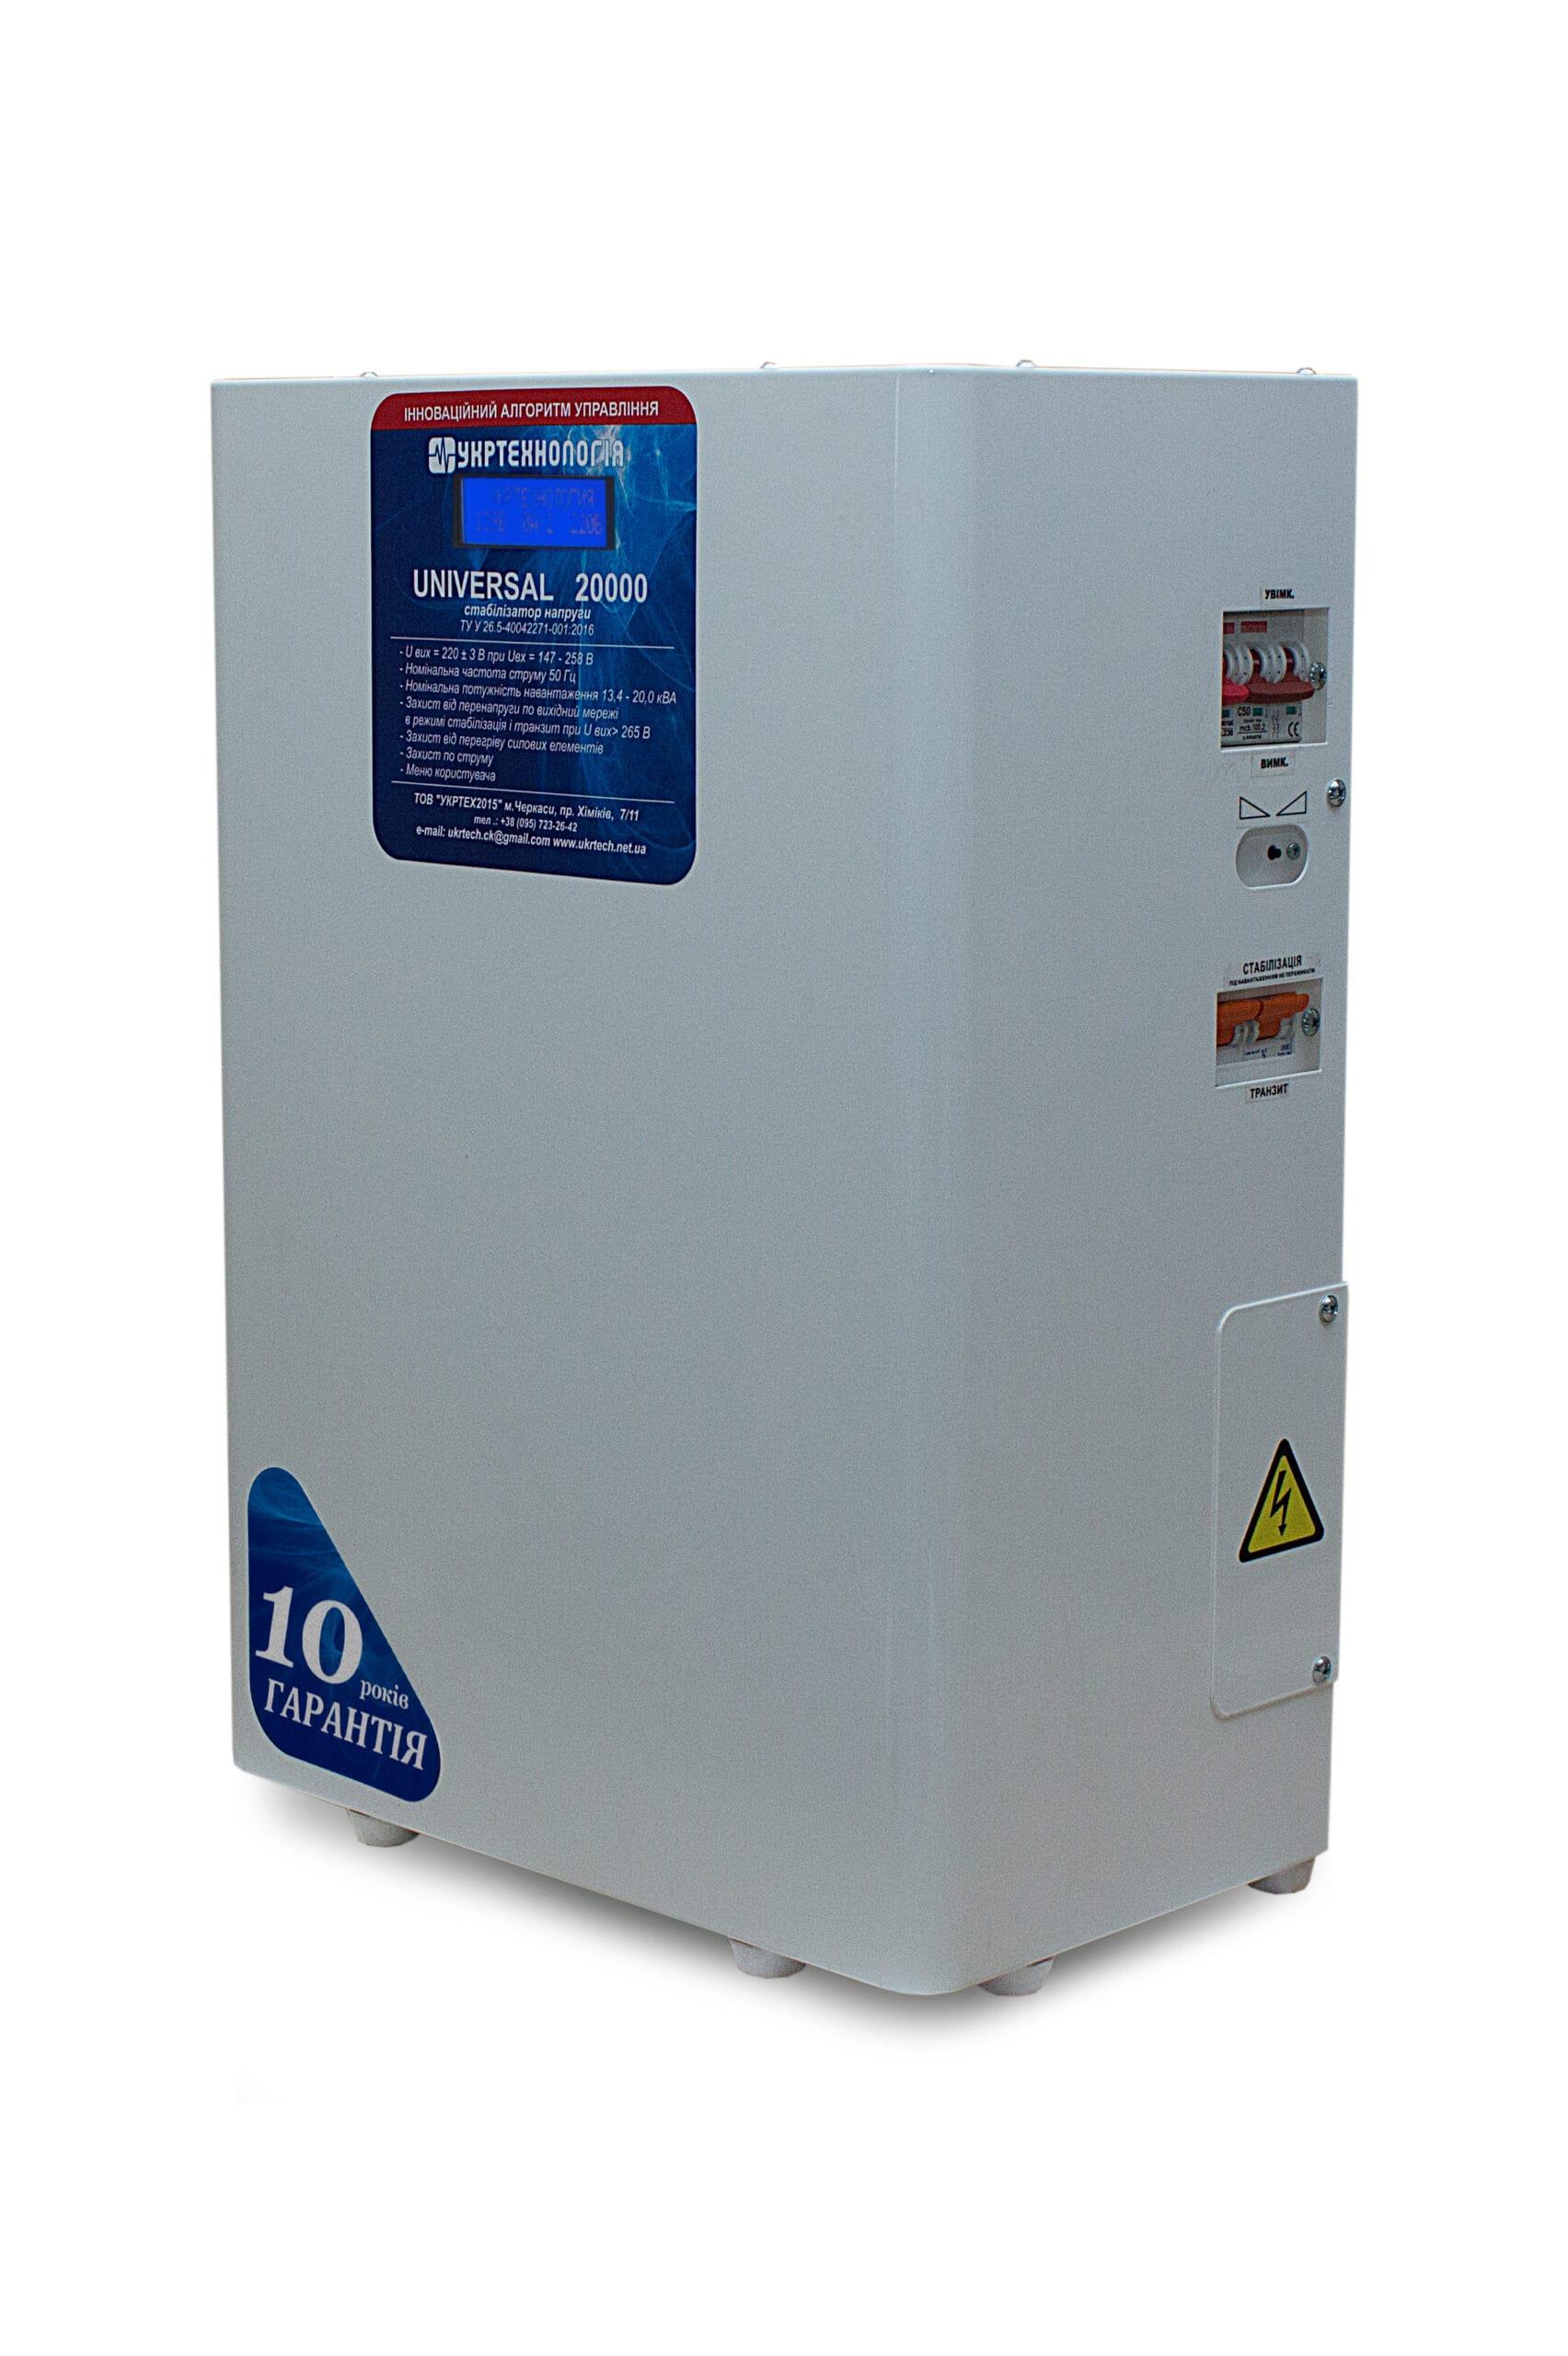 Стабилизаторы напряжения - Стабилизатор напряжения 20 кВт UNIVERSAL 000001422 - Фото 1